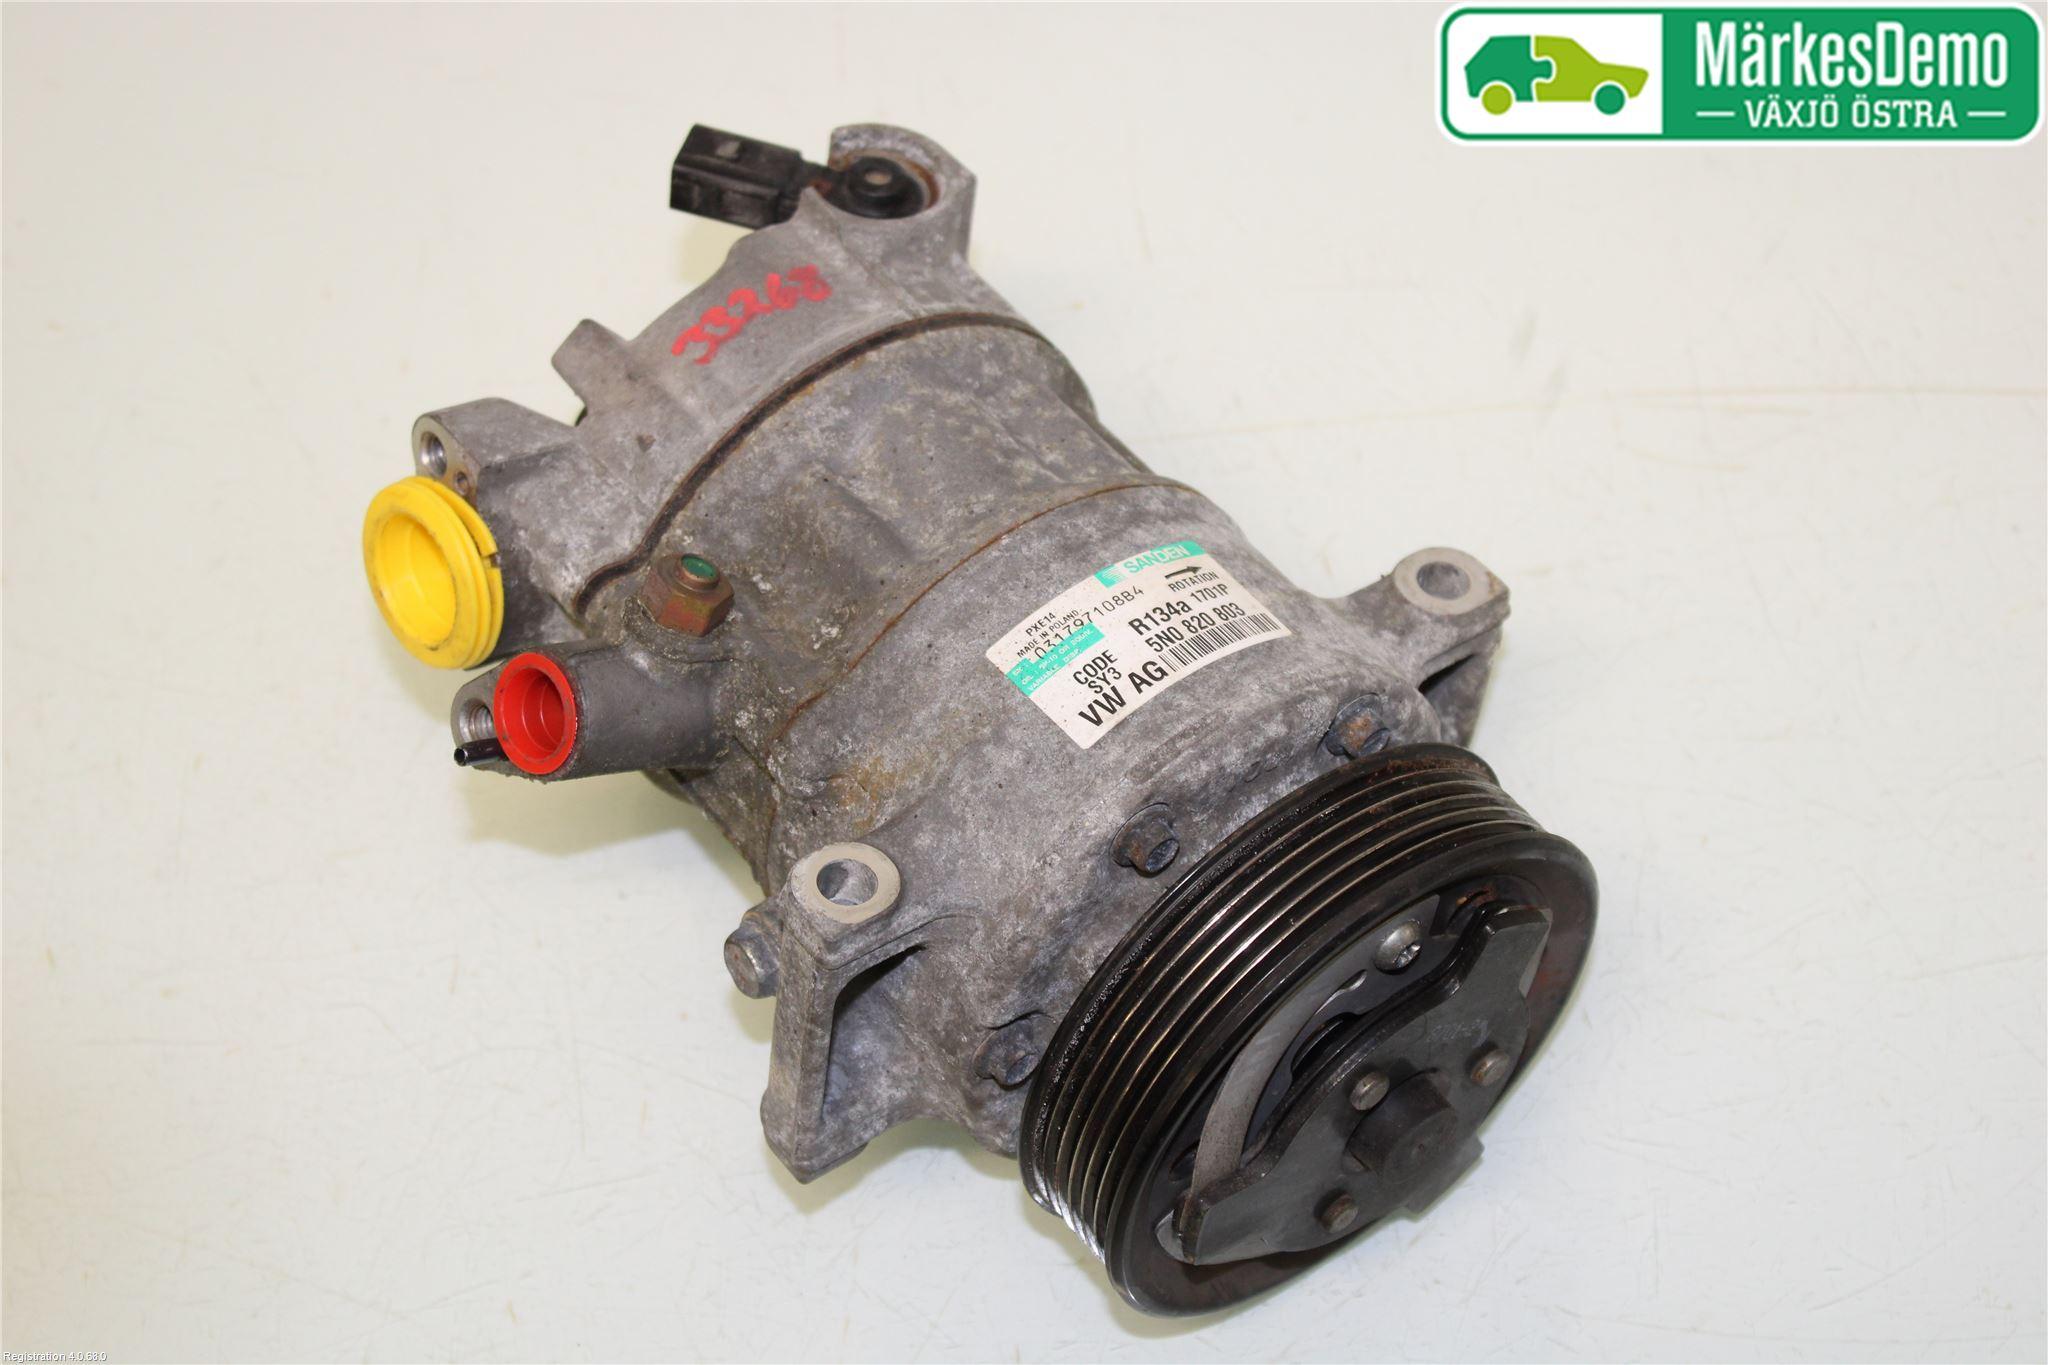 Ac kompressor - Sanden image